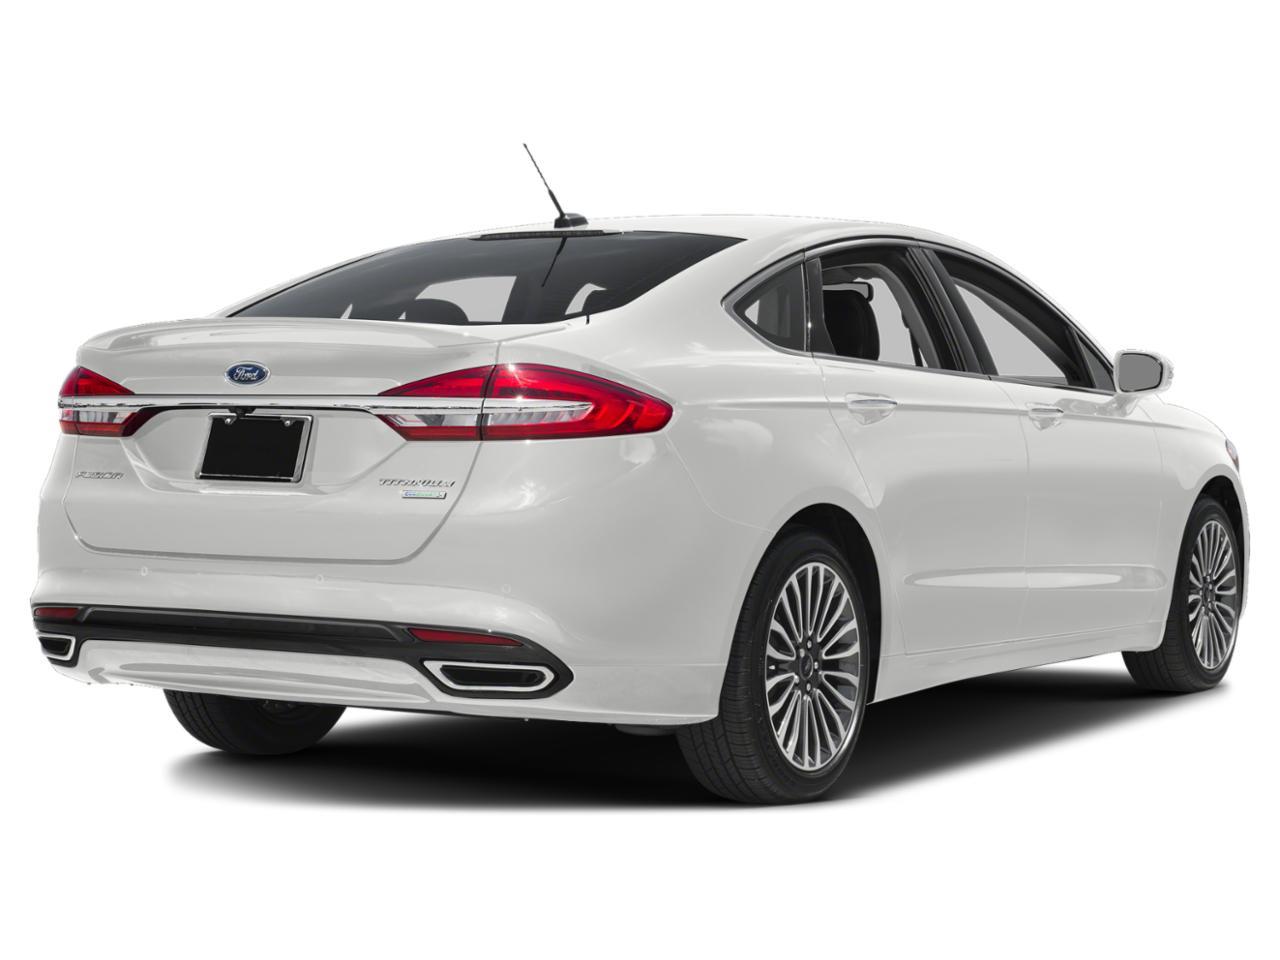 2018 Ford Fusion TITANIUM 4dr Car Slide